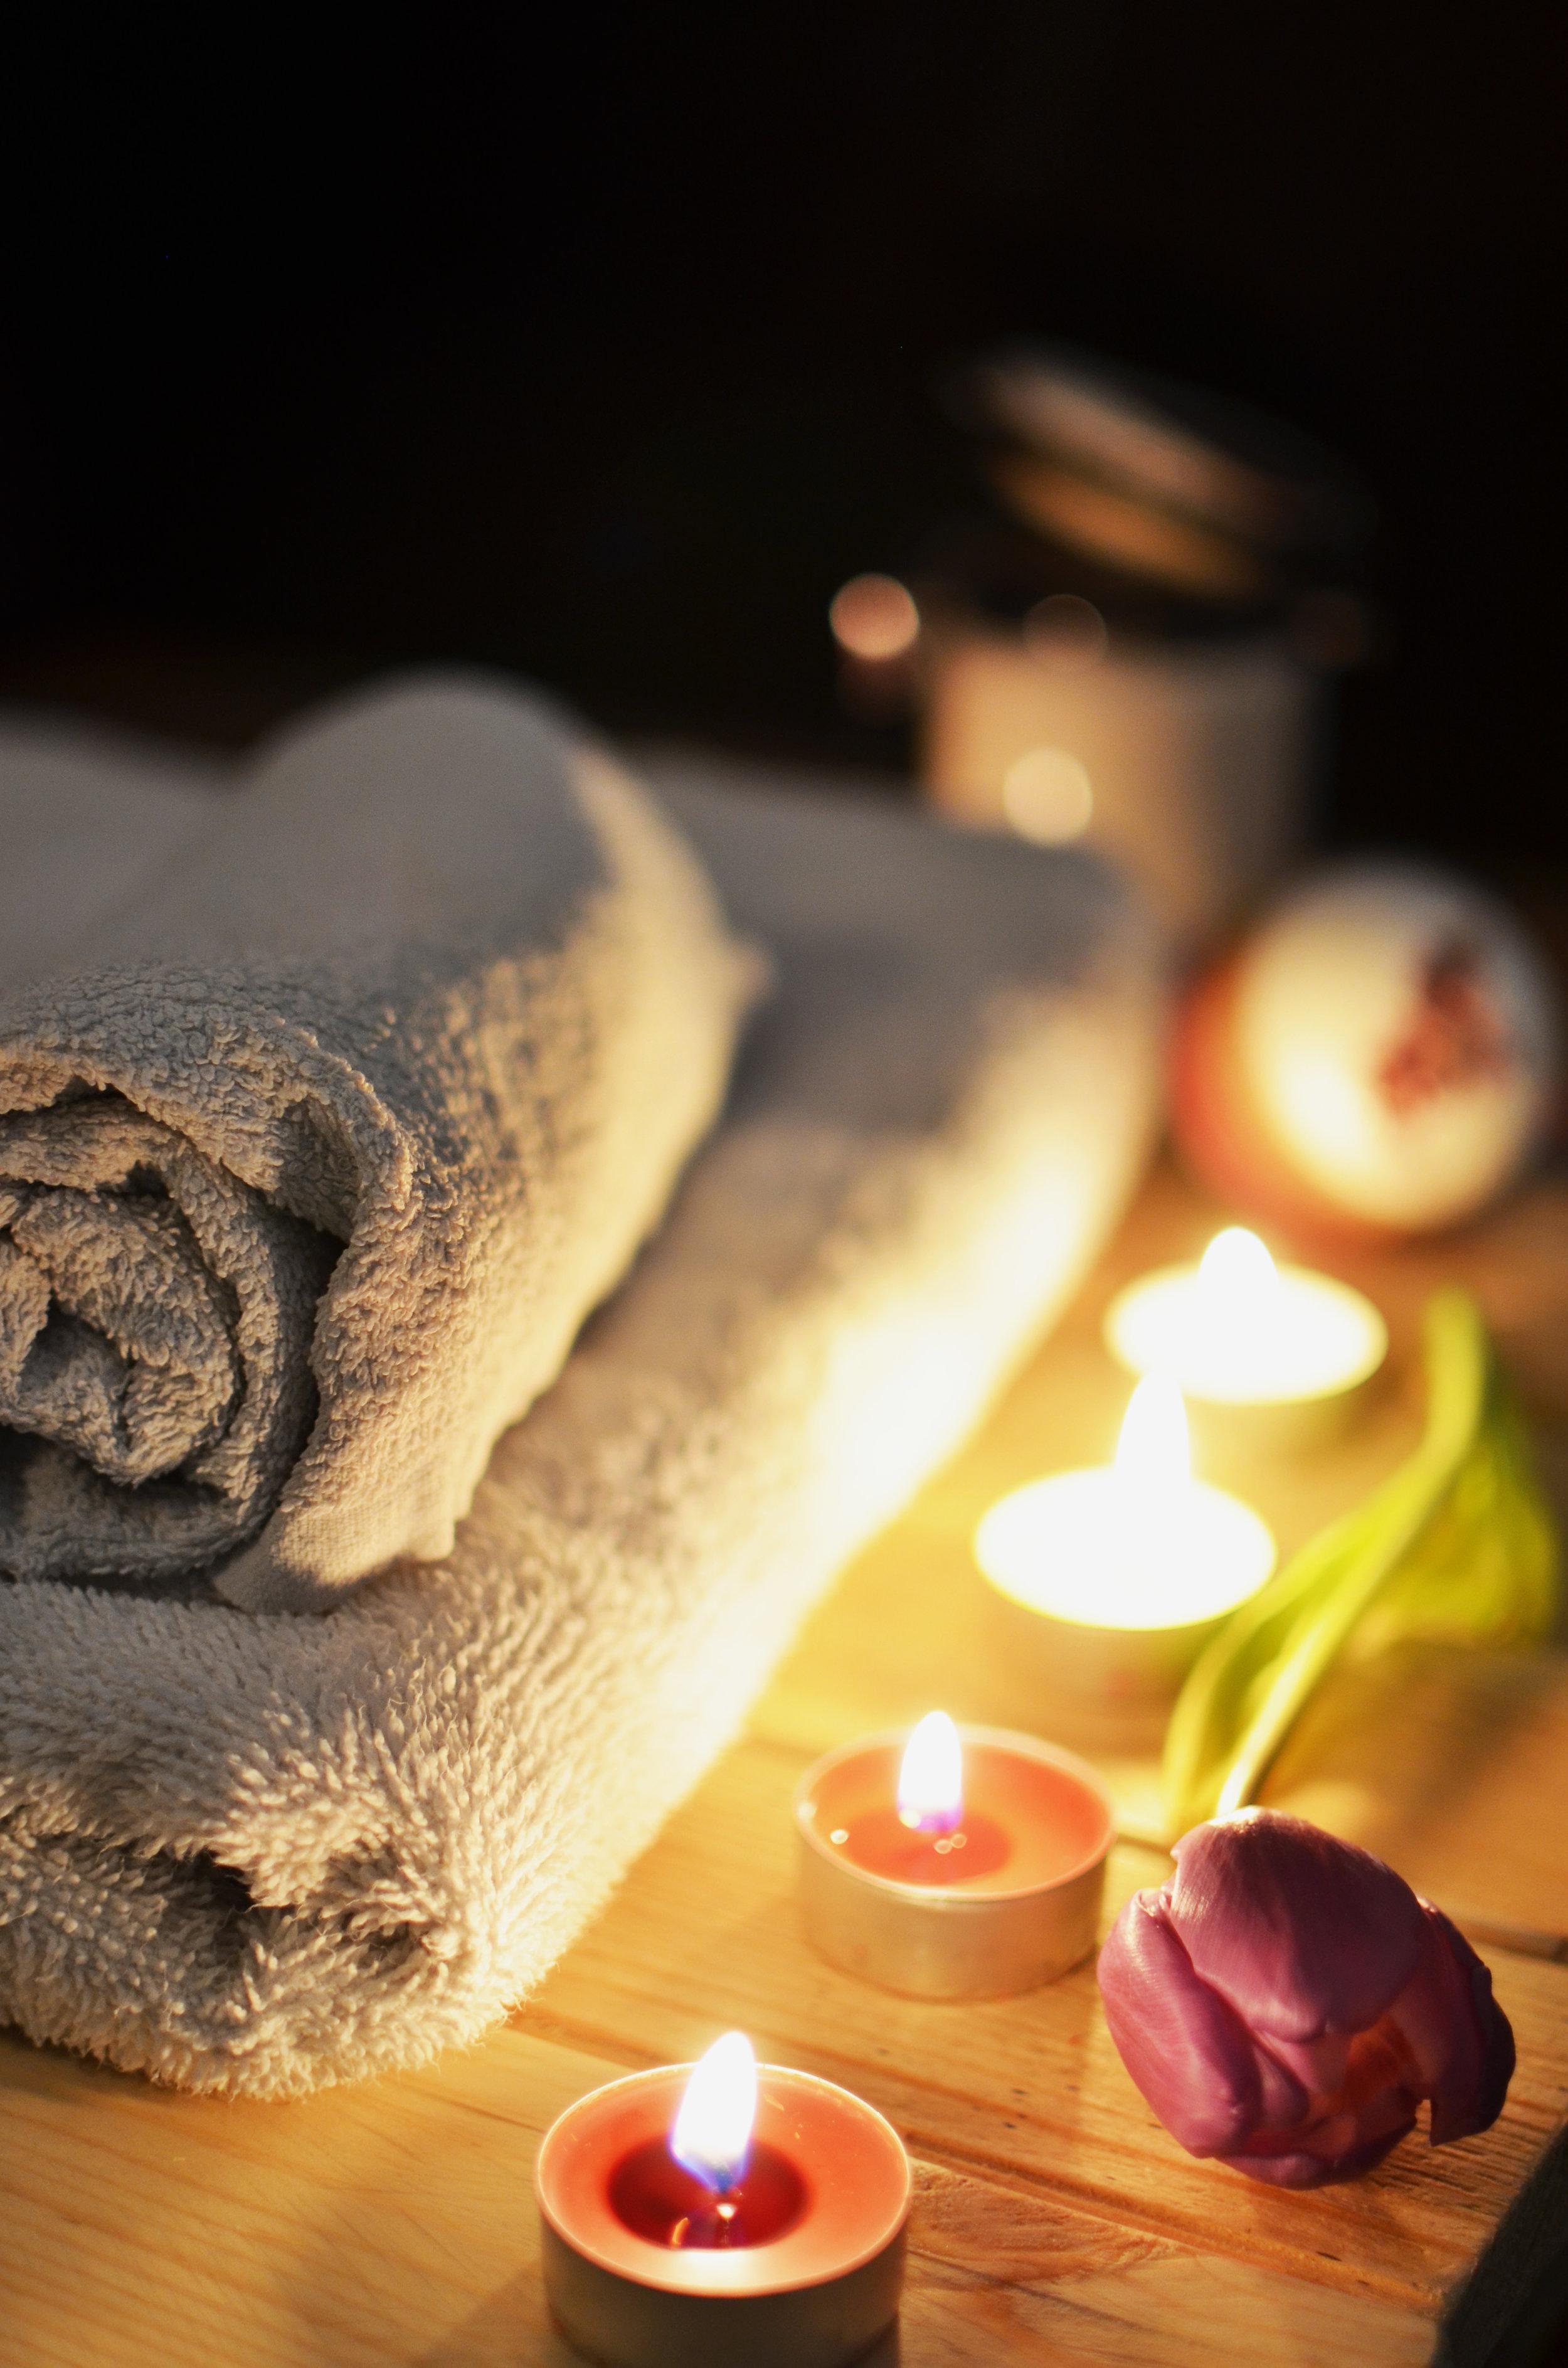 love-romantic-bath-candlelight.jpg